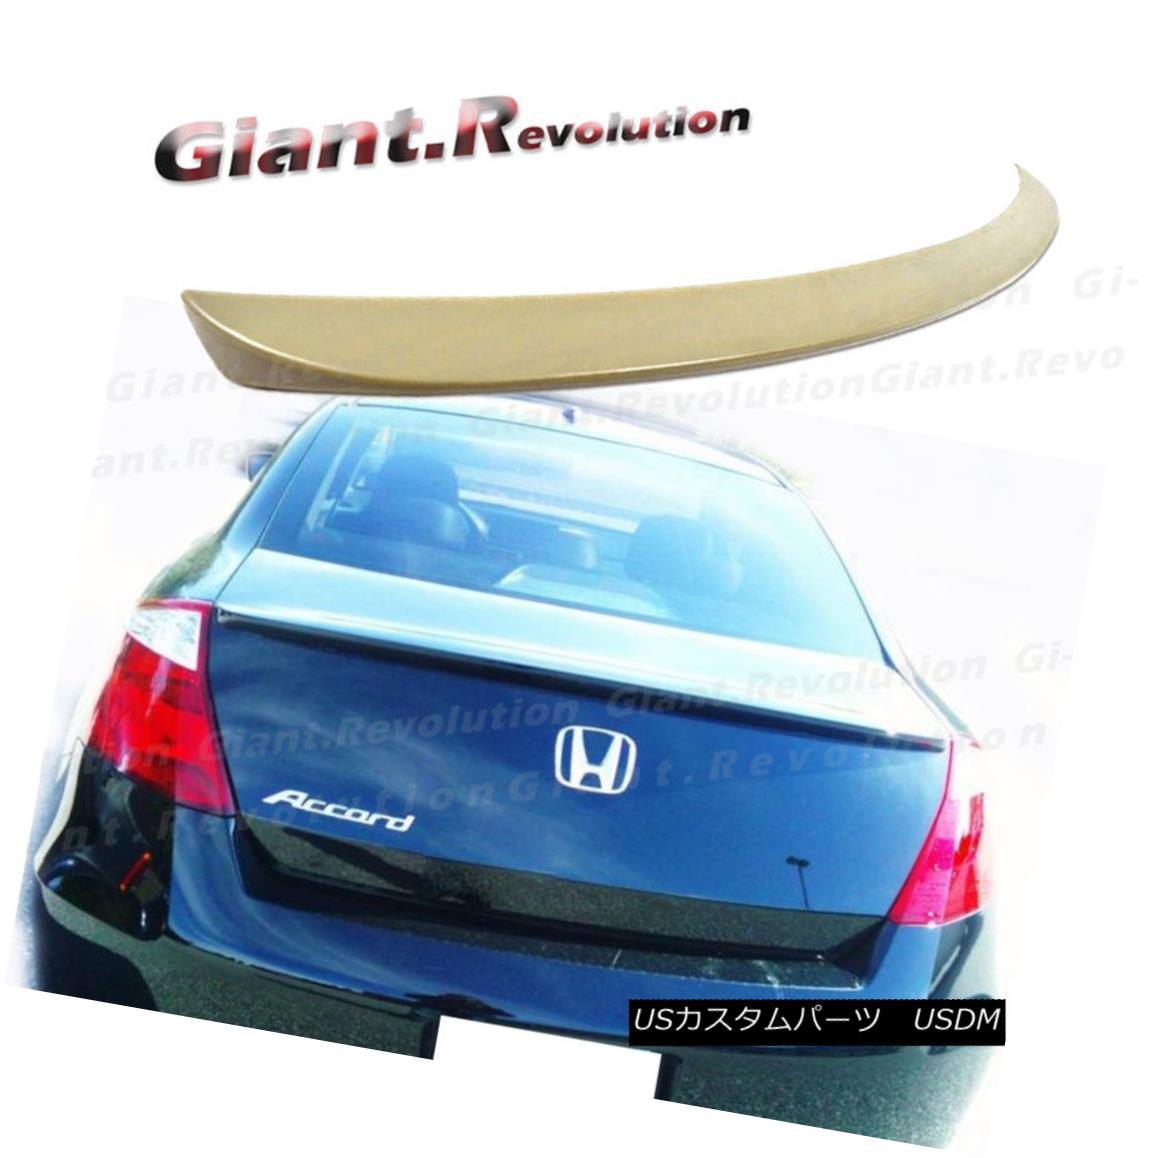 New OEM Honda Accord 4Dr Sedan Rear Spoiler Type 1 Night Blue Pearl 2008-2012